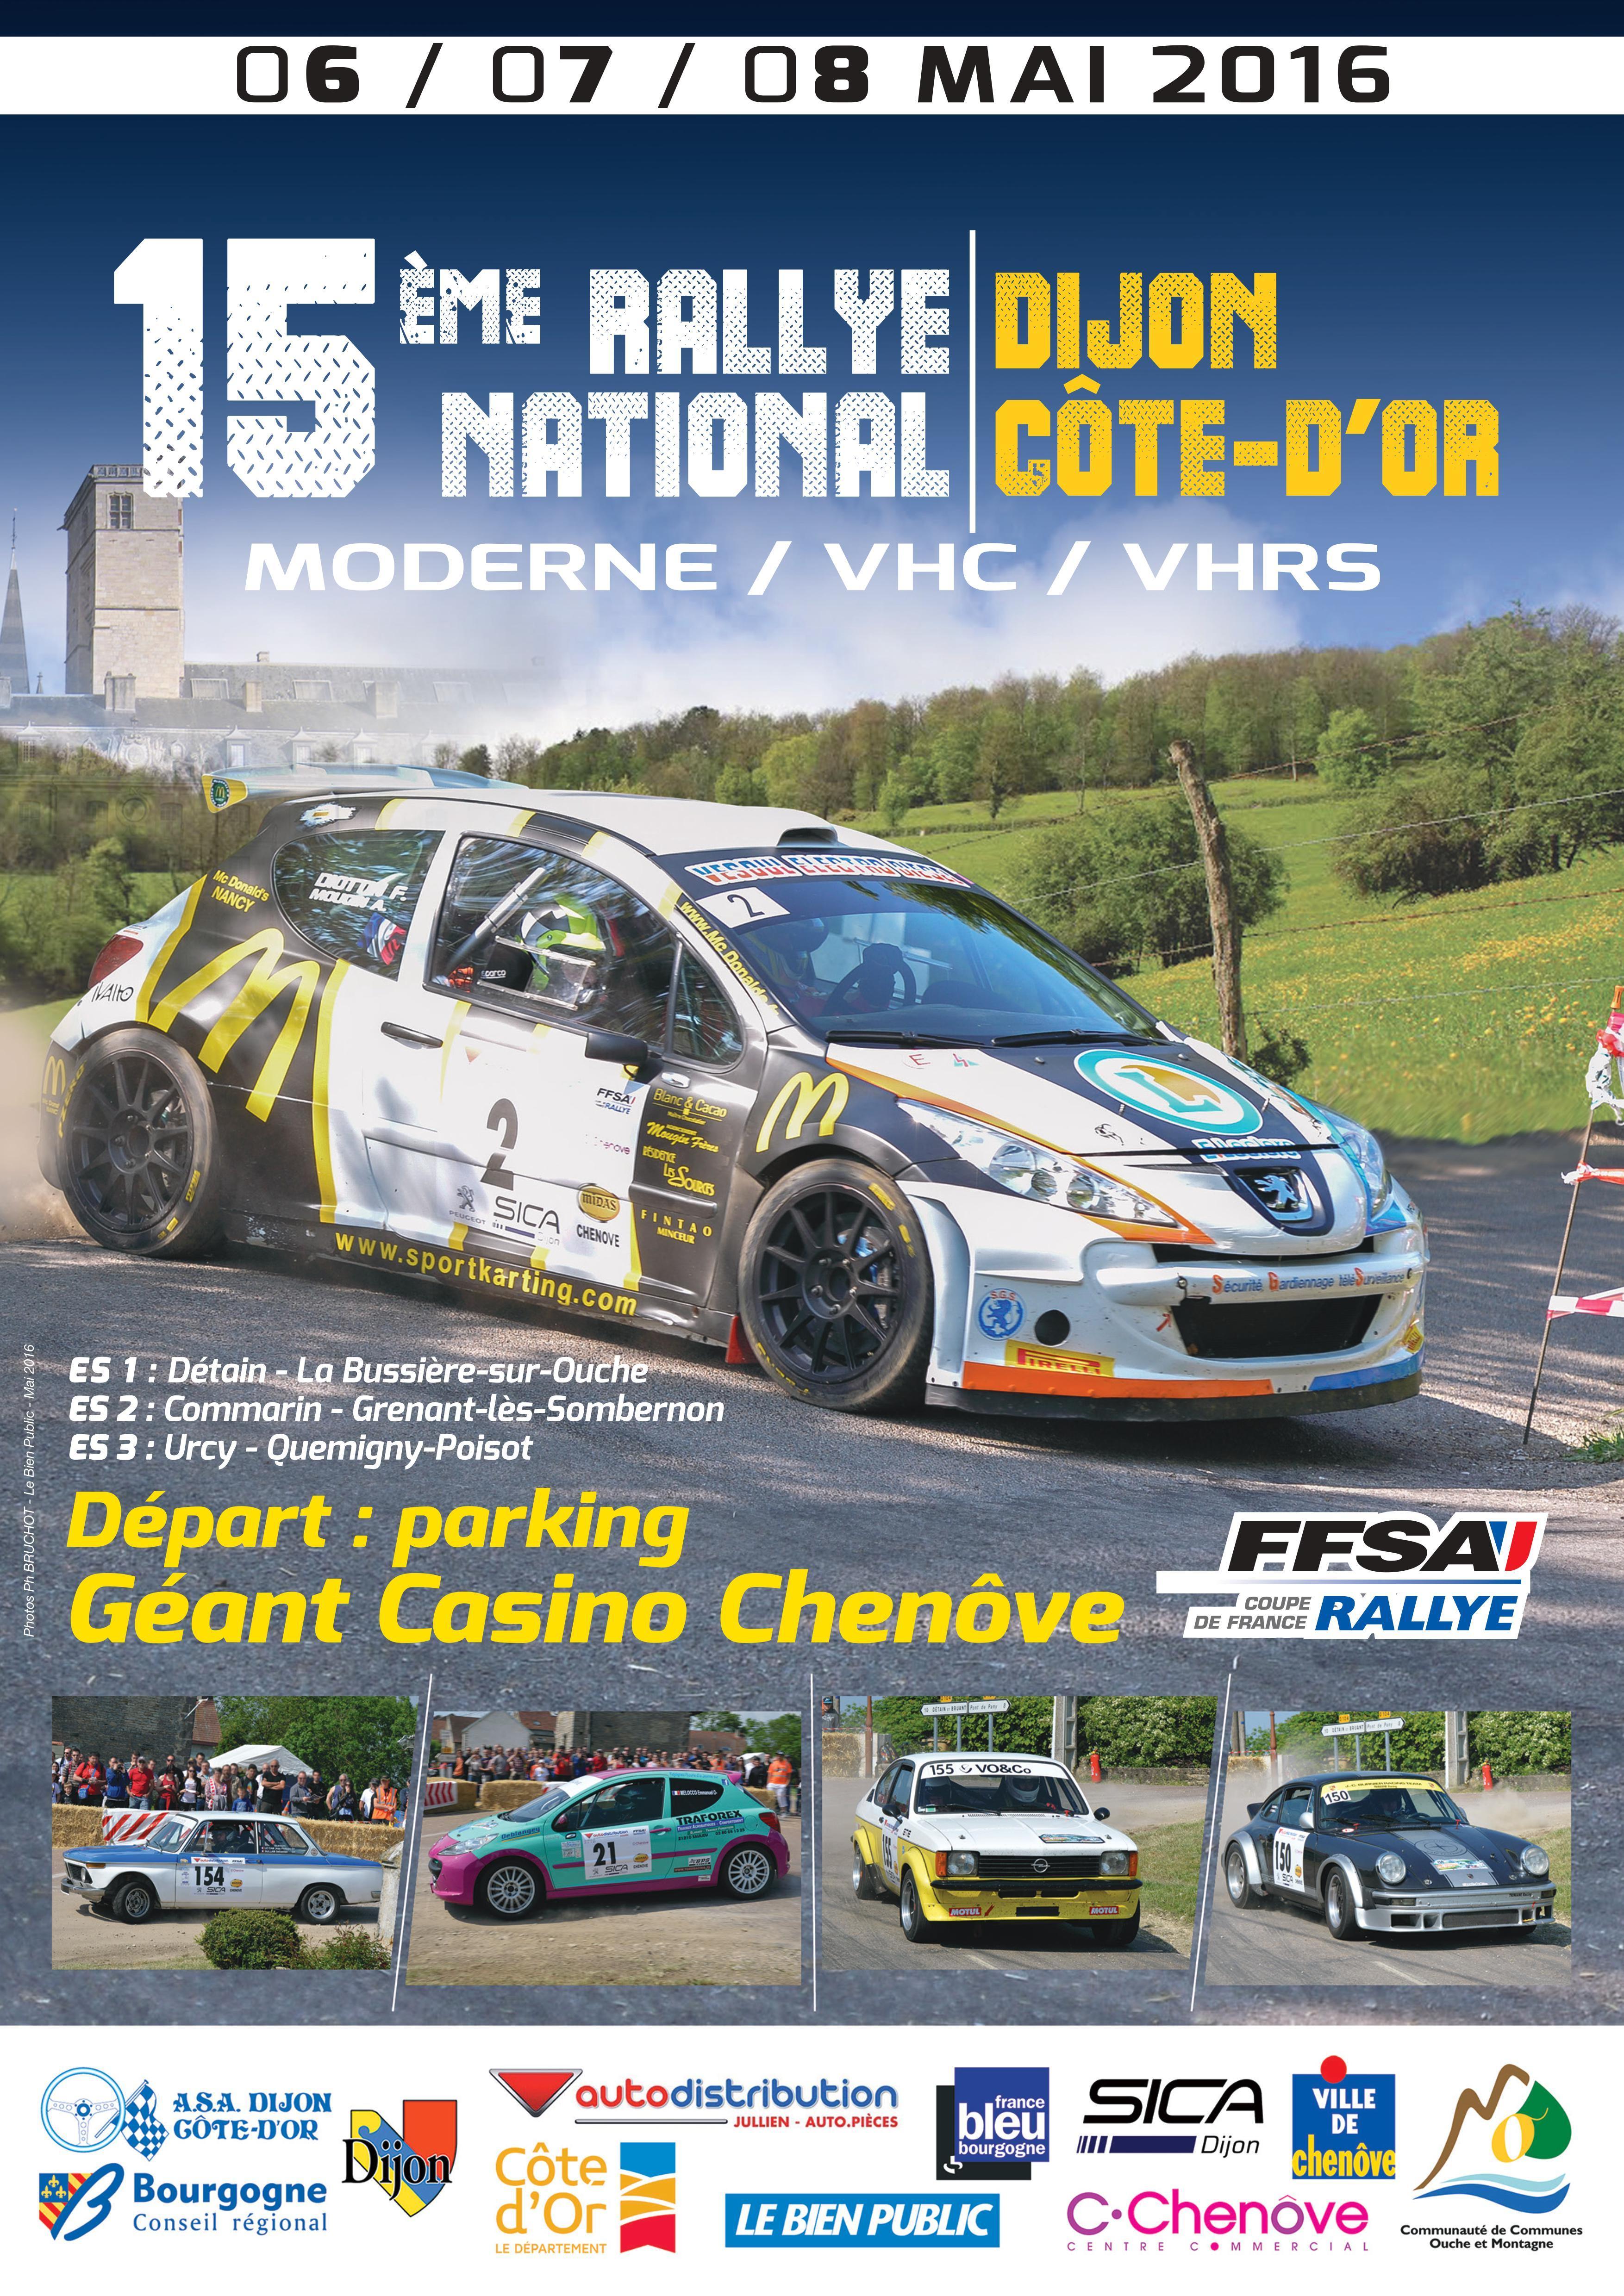 Liste-des-engages-Rallye-Dijon-Cote-dOr-2016